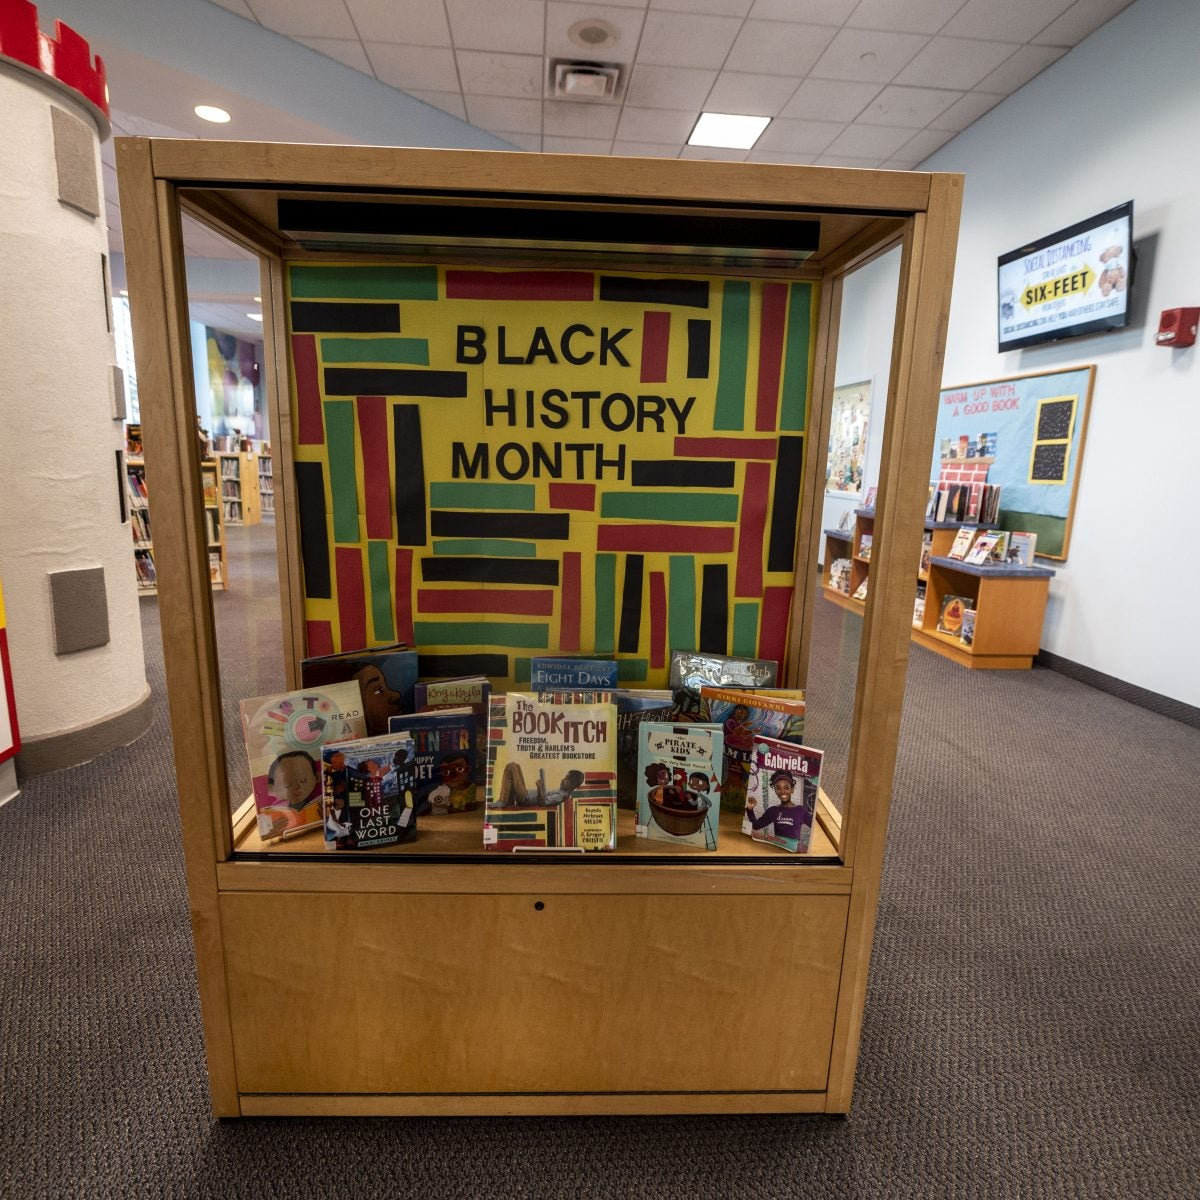 Utah Charter School Reverses Position on Black History Month Curriculum